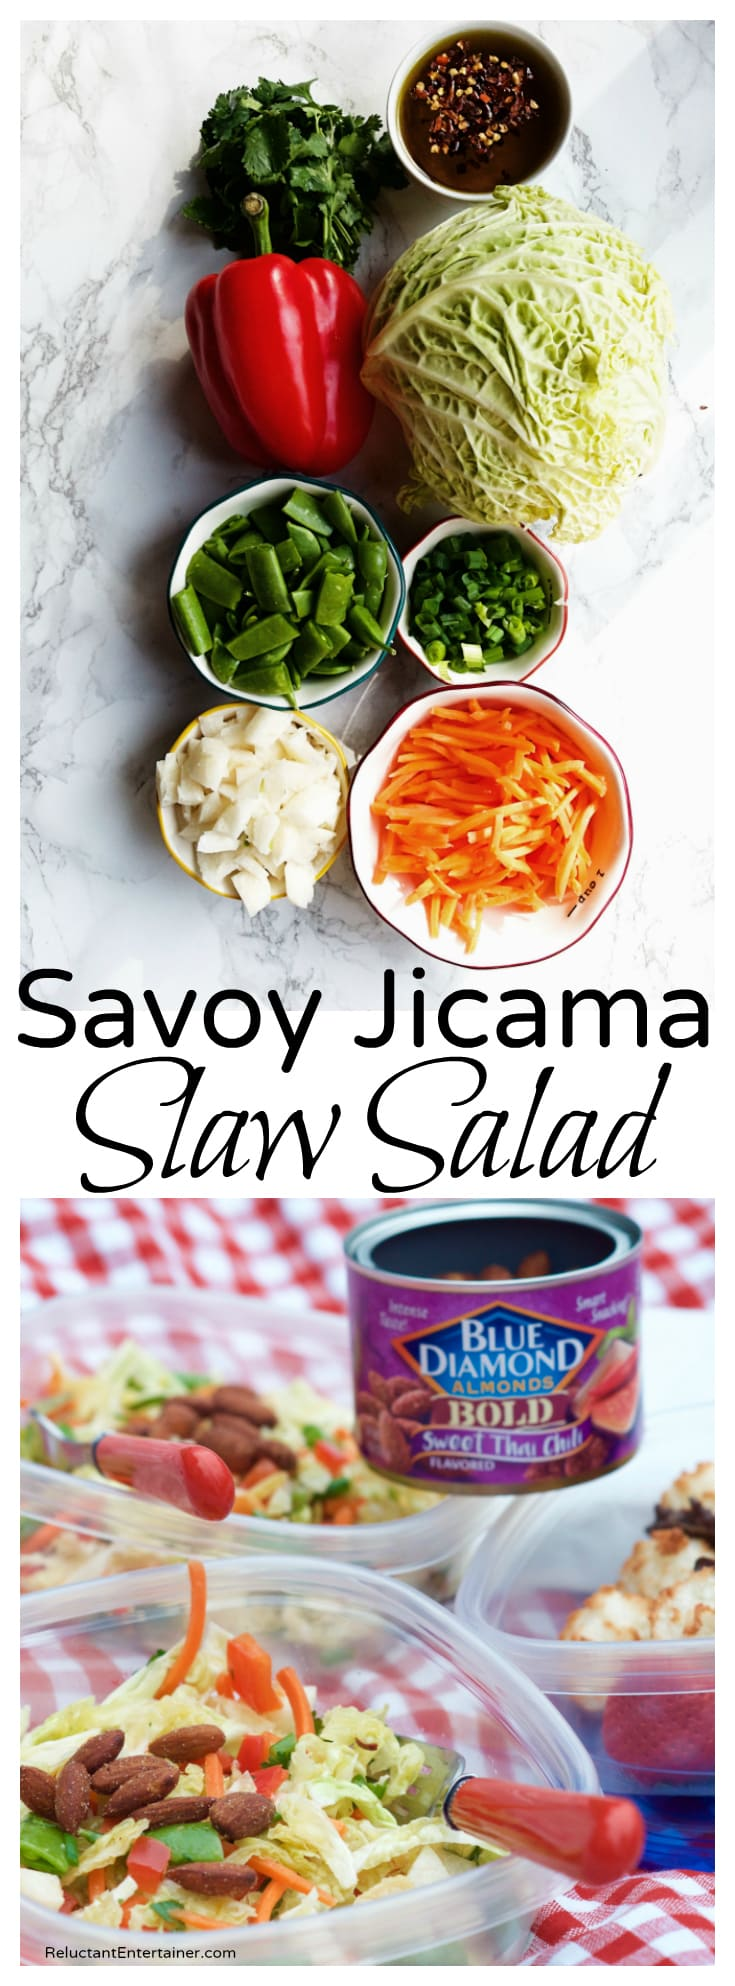 Savoy Jicama Slaw Salad Recipe partnered with Blue Diamond